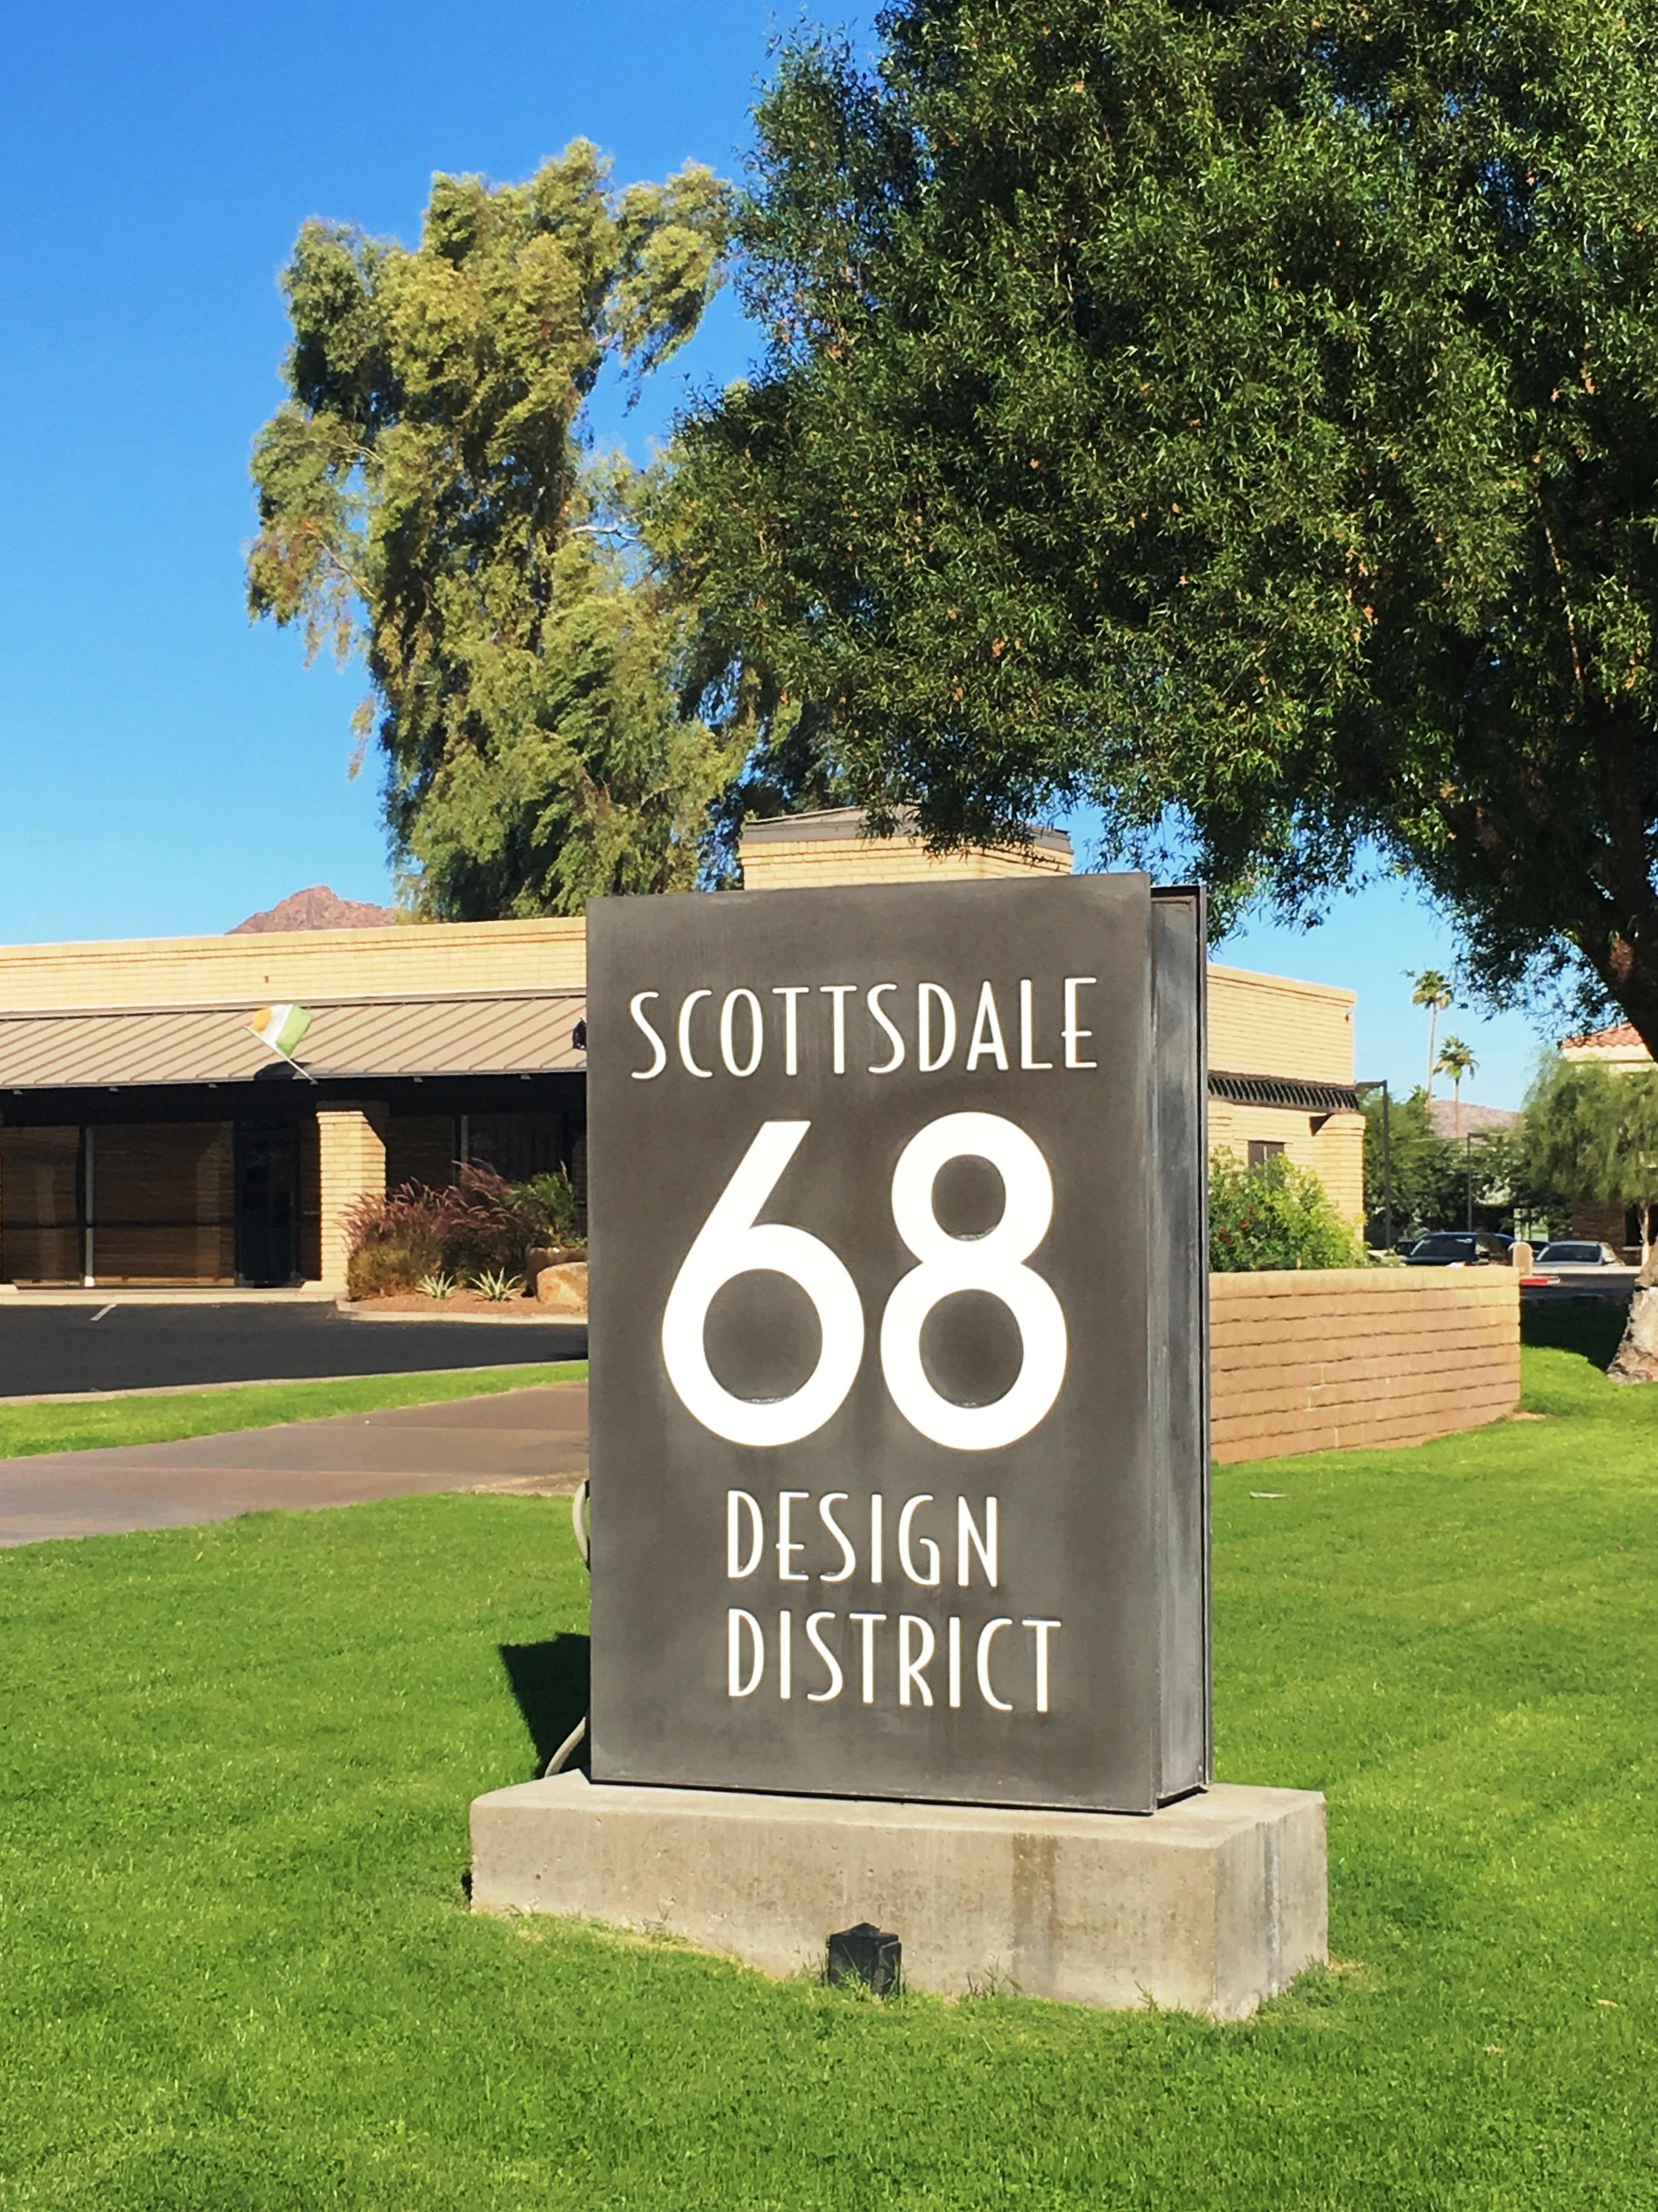 scottsdale design district